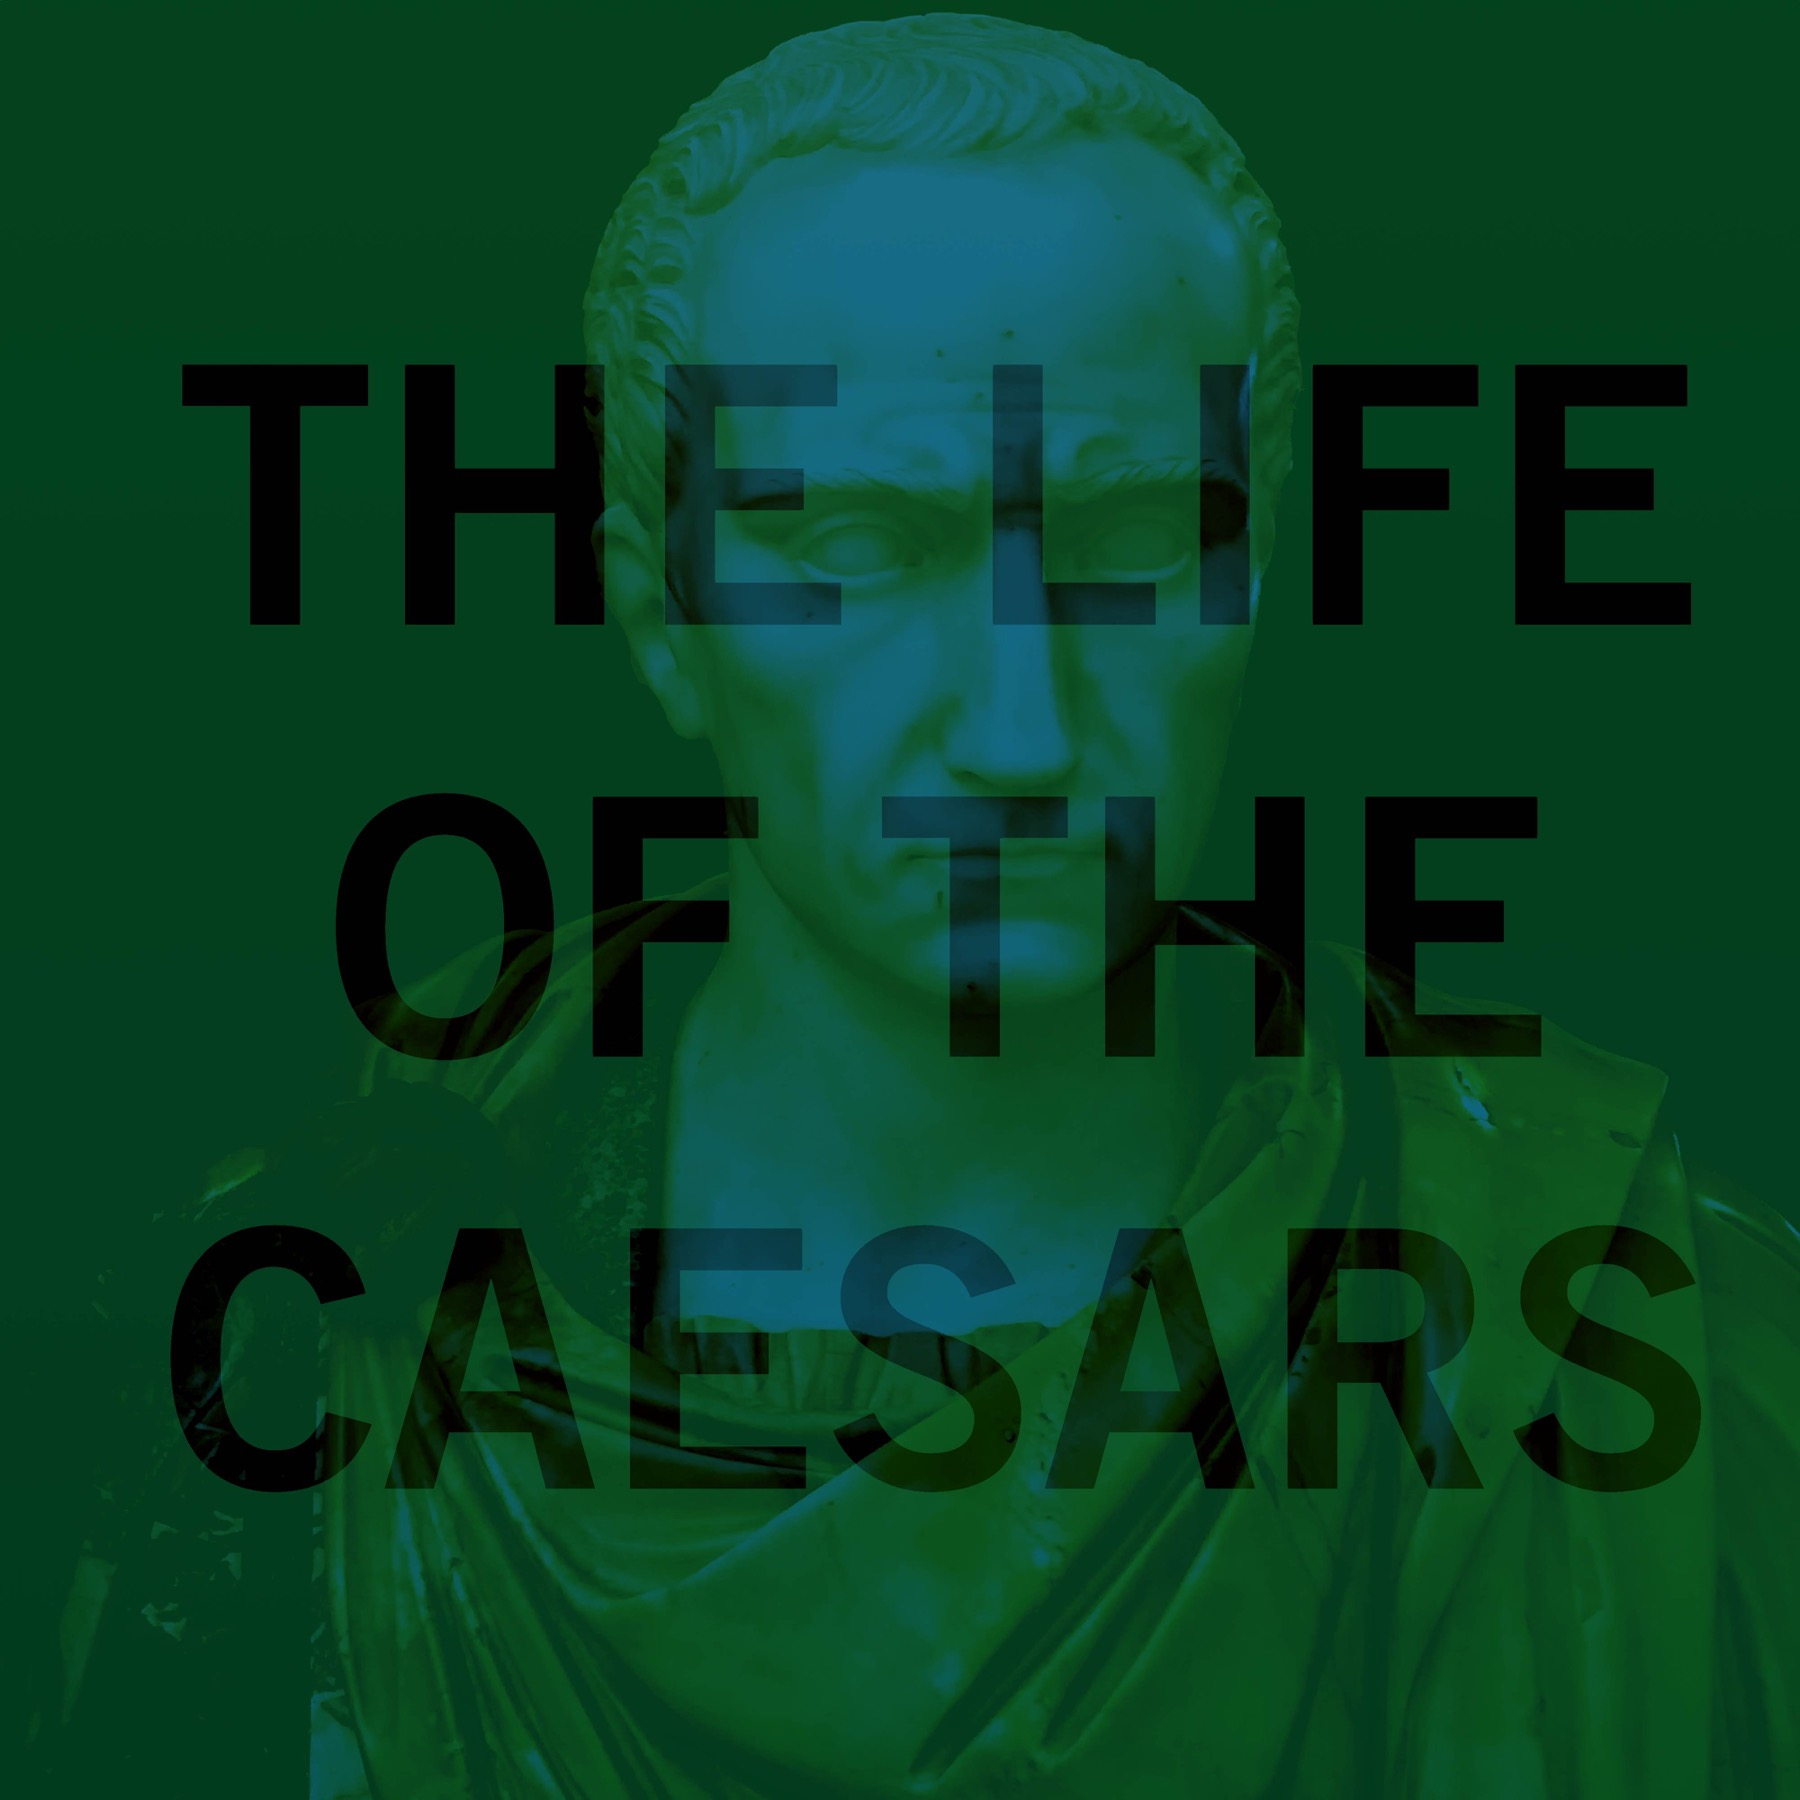 Caligula #24 – Hoc Age